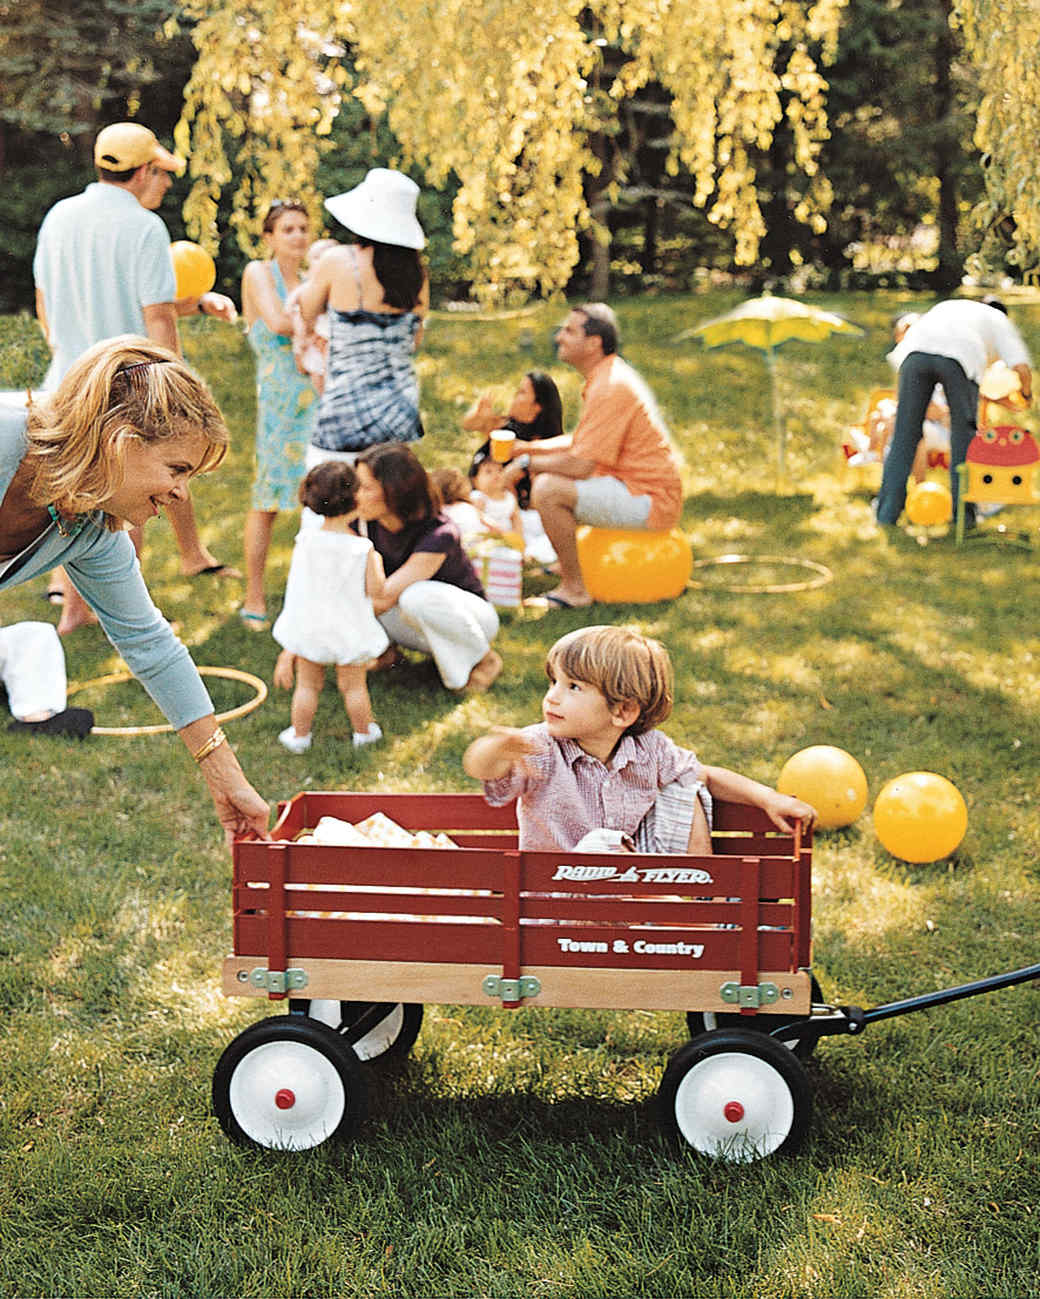 daisys-birthday-ma101007-party01.jpg